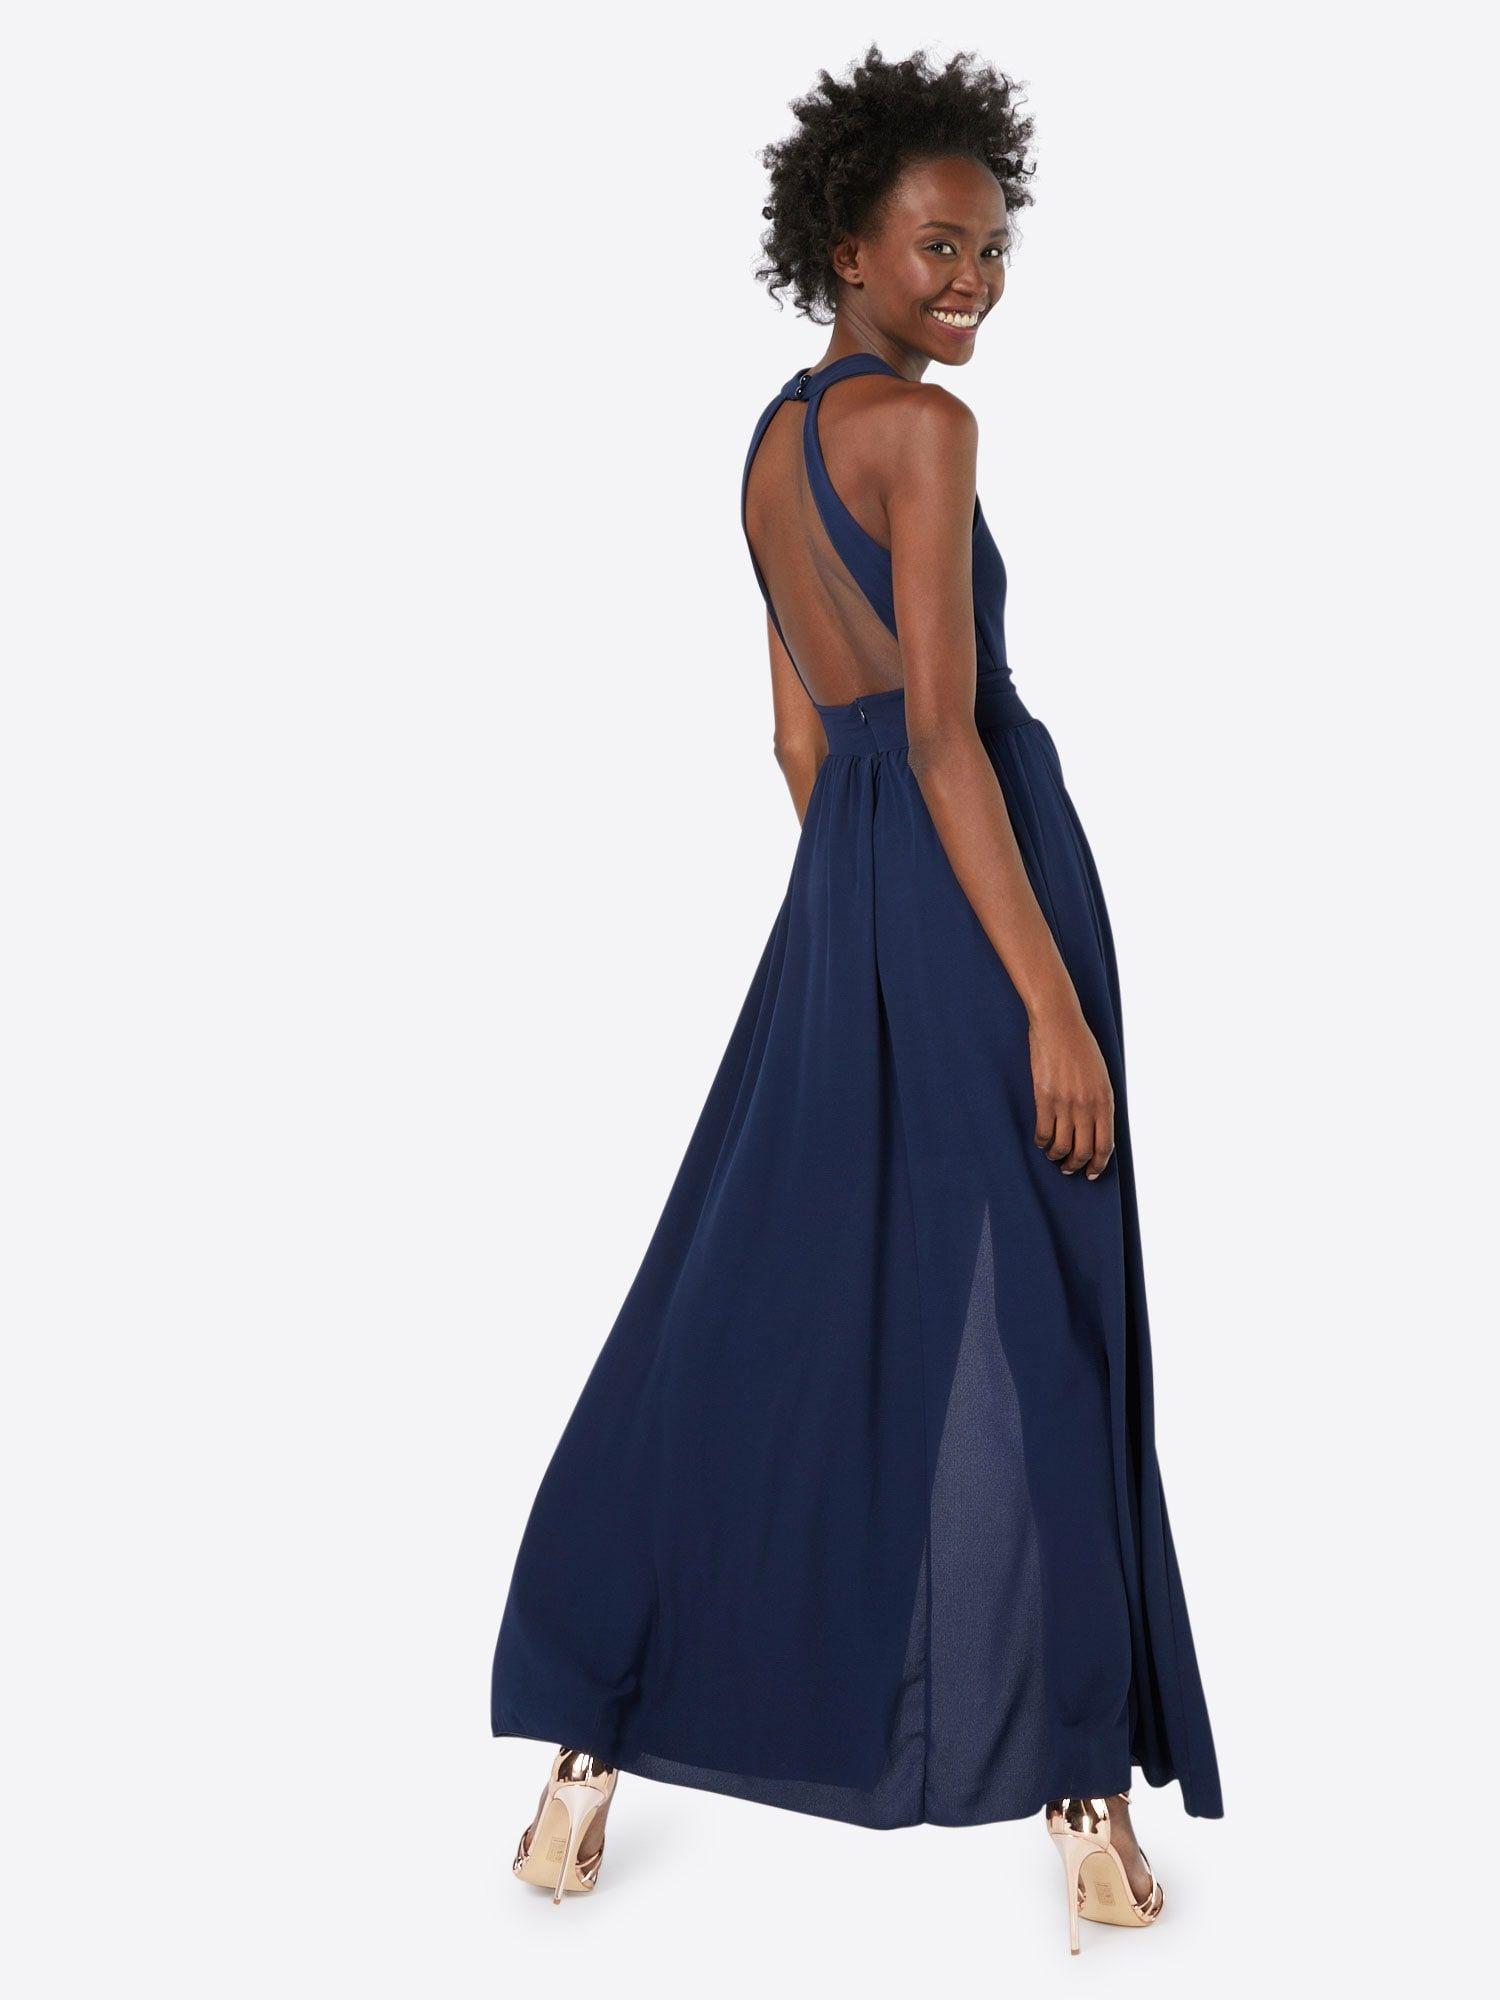 17 Einzigartig Wal G Abendkleid StylishAbend Einfach Wal G Abendkleid Ärmel